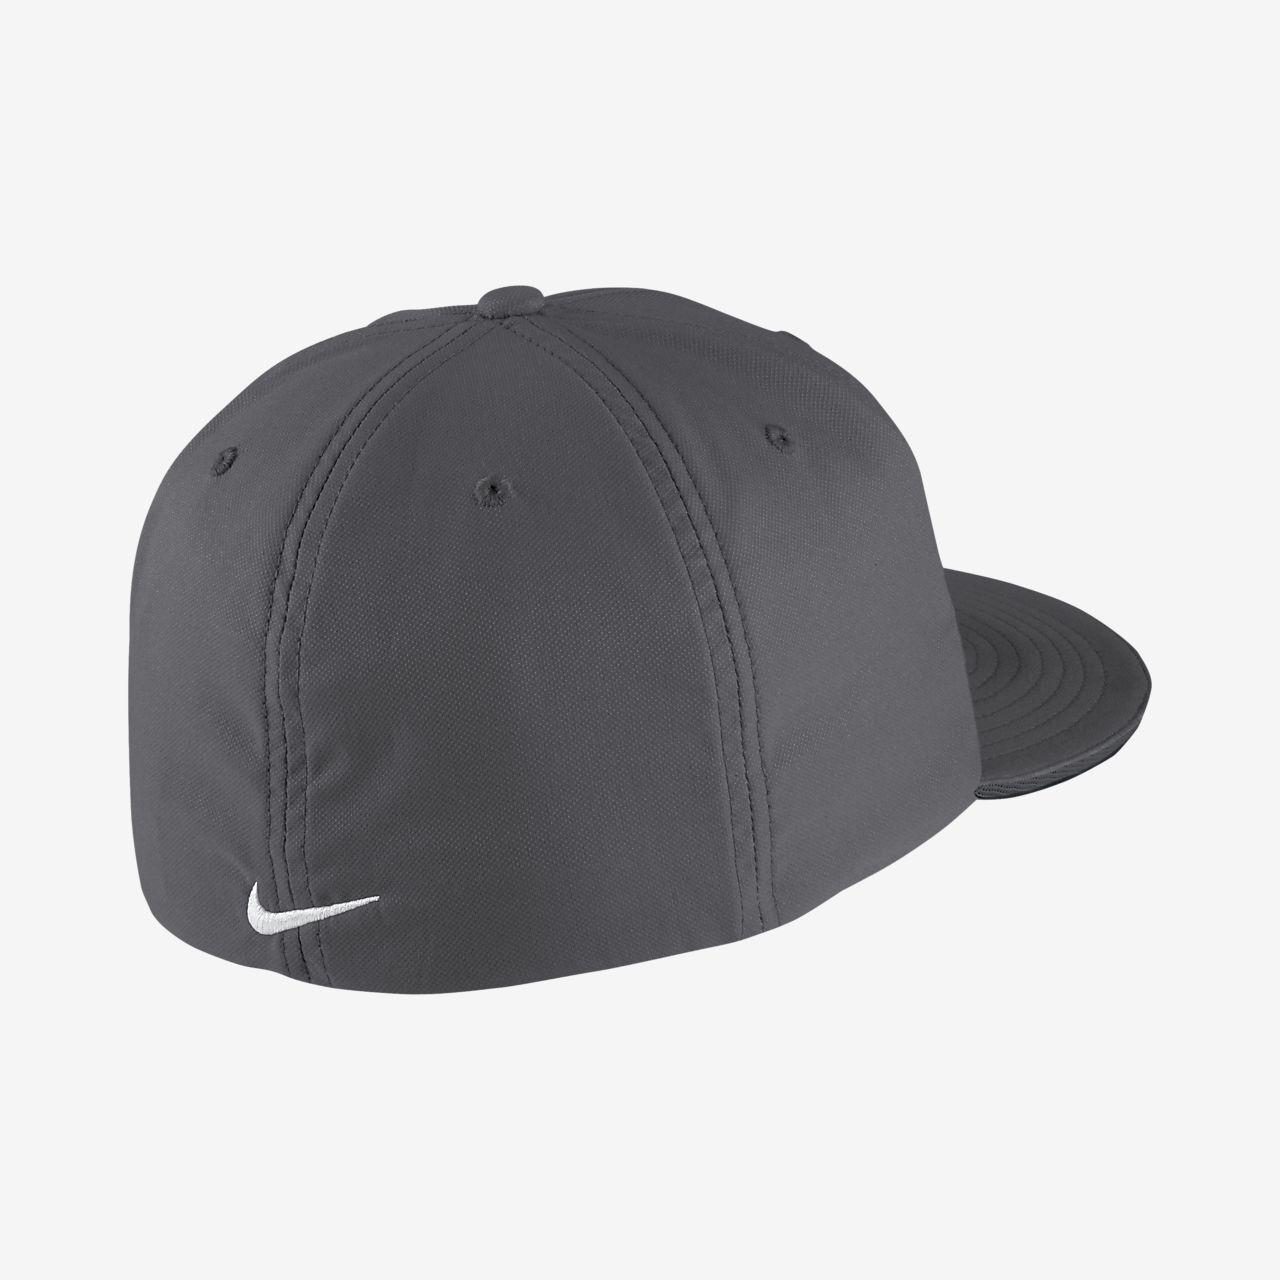 58c6f277a Nike Golf True Statement Fitted Hat